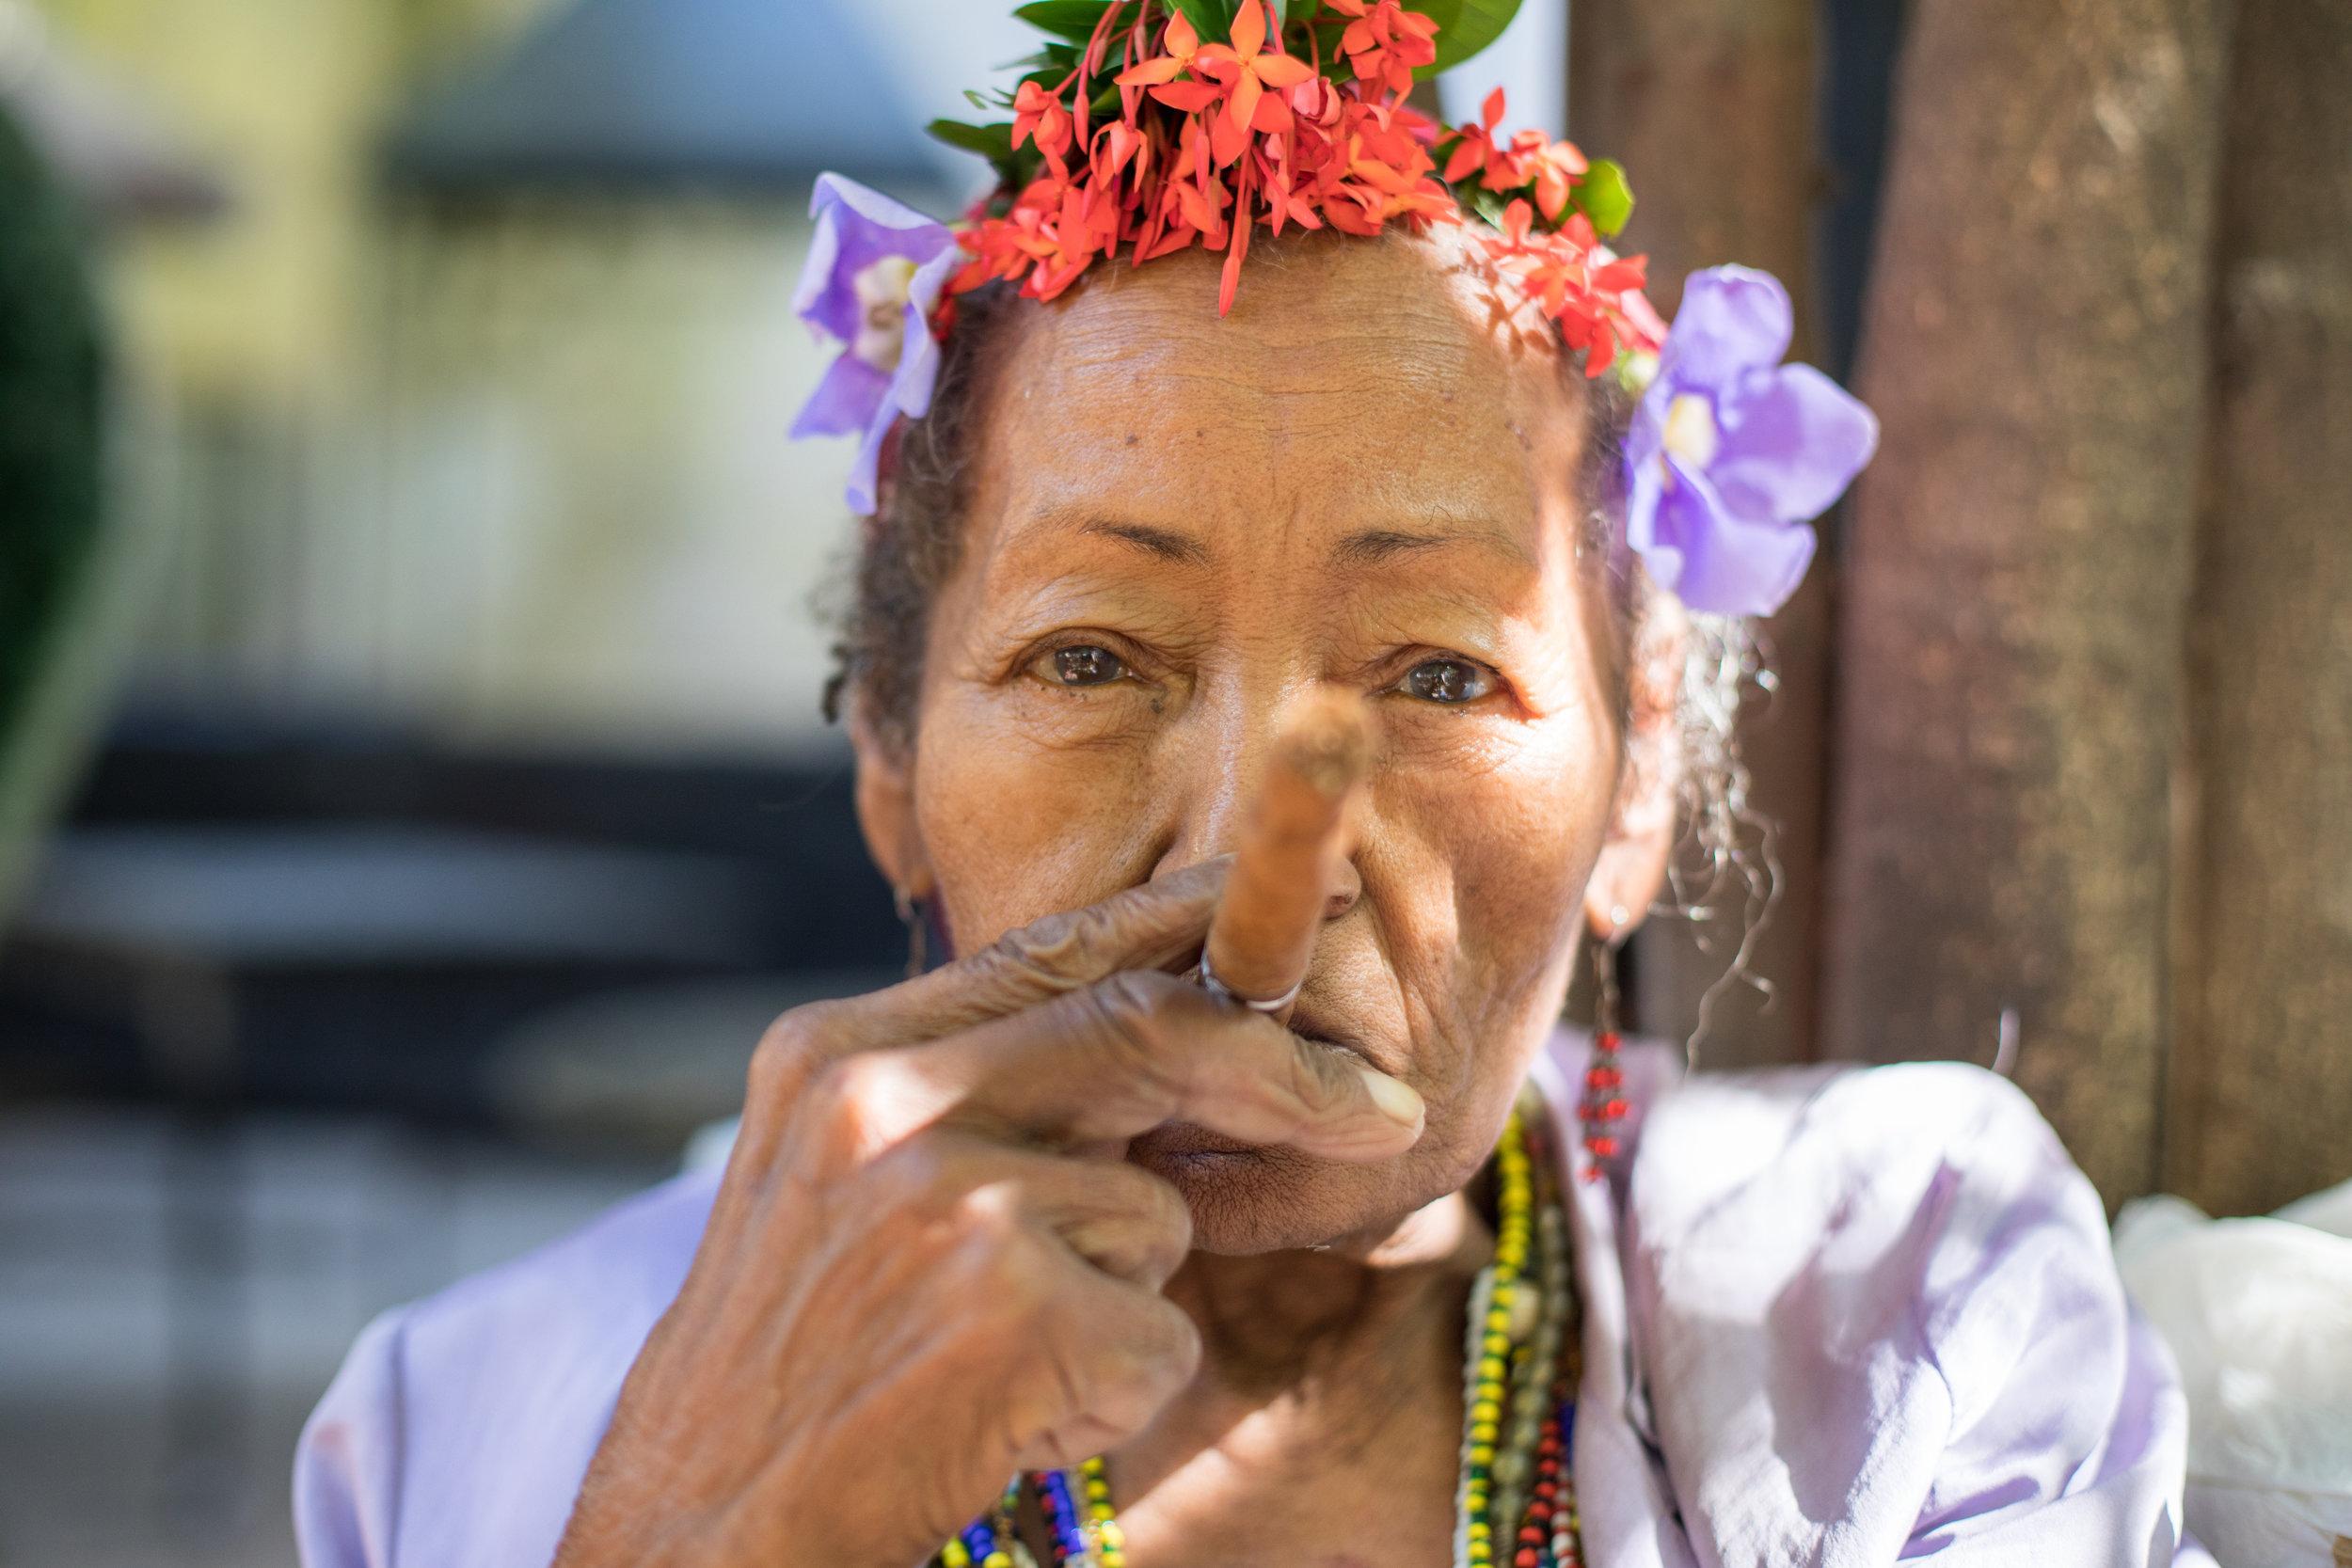 2.  Portrait Photography in Cuba.